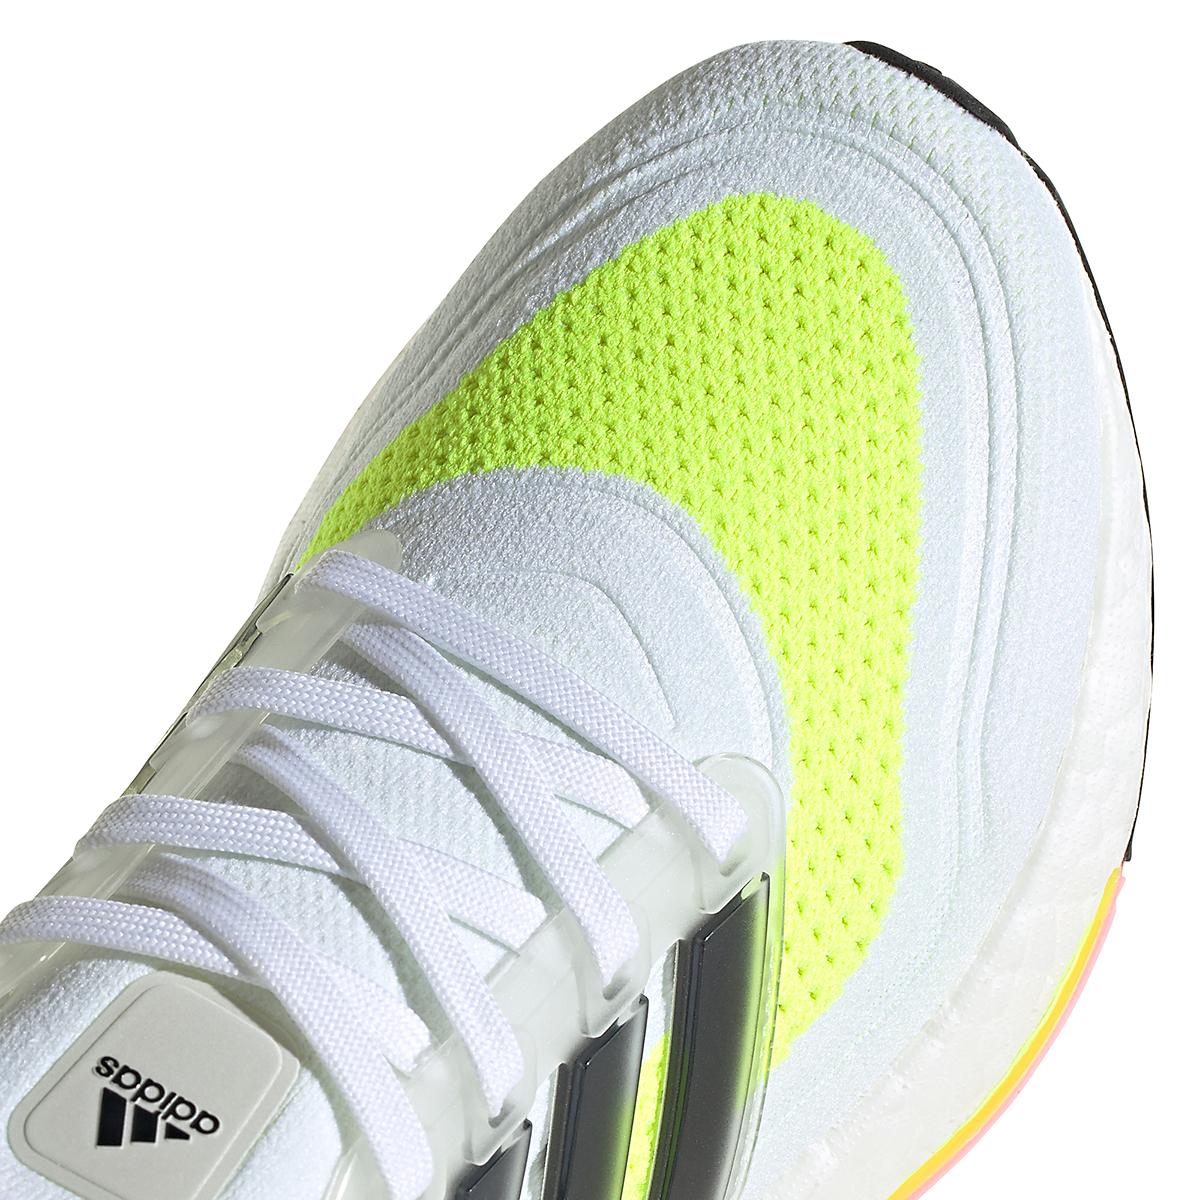 Women's Adidas Ultraboost 21 Running Shoe - Color: Cloud White/Black/Solar Yellow - Size: 5 - Width: Regular, Cloud White/Black/Solar Yellow, large, image 2